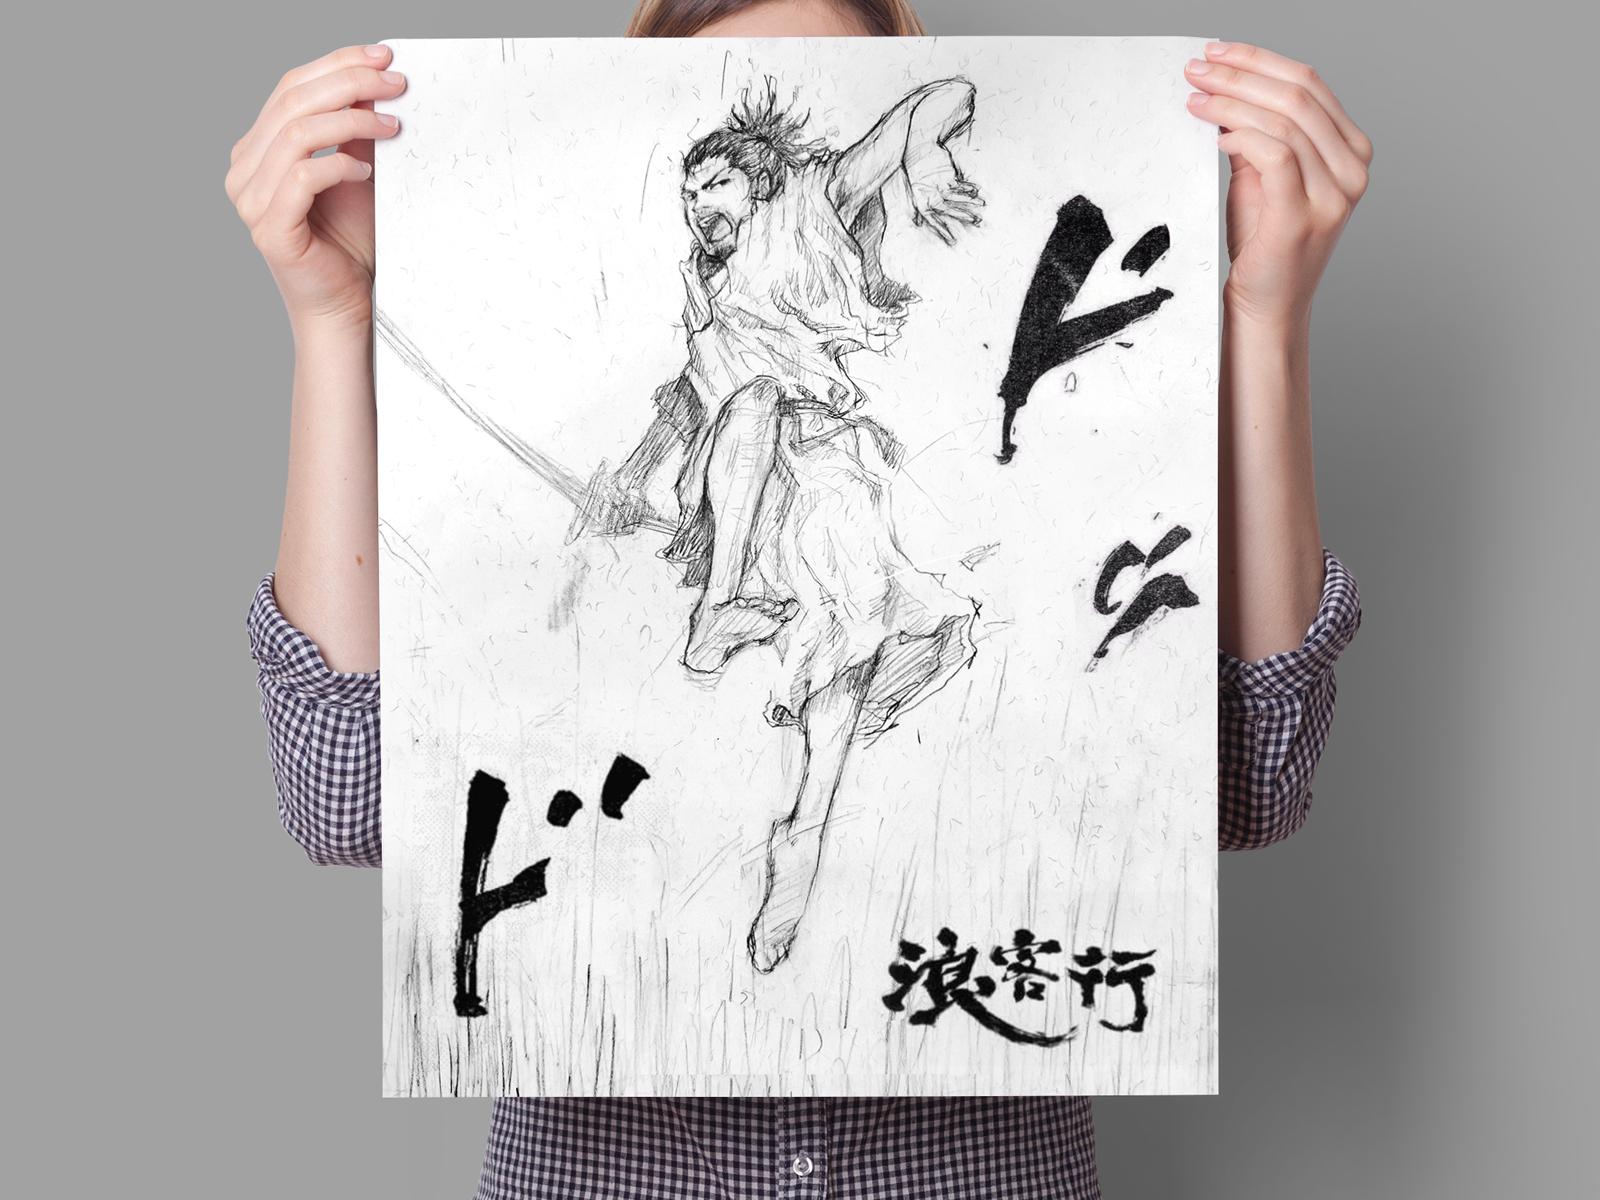 Takehiko Inoue バガボンド Vagabond Tribute Works By Wangtianyu On